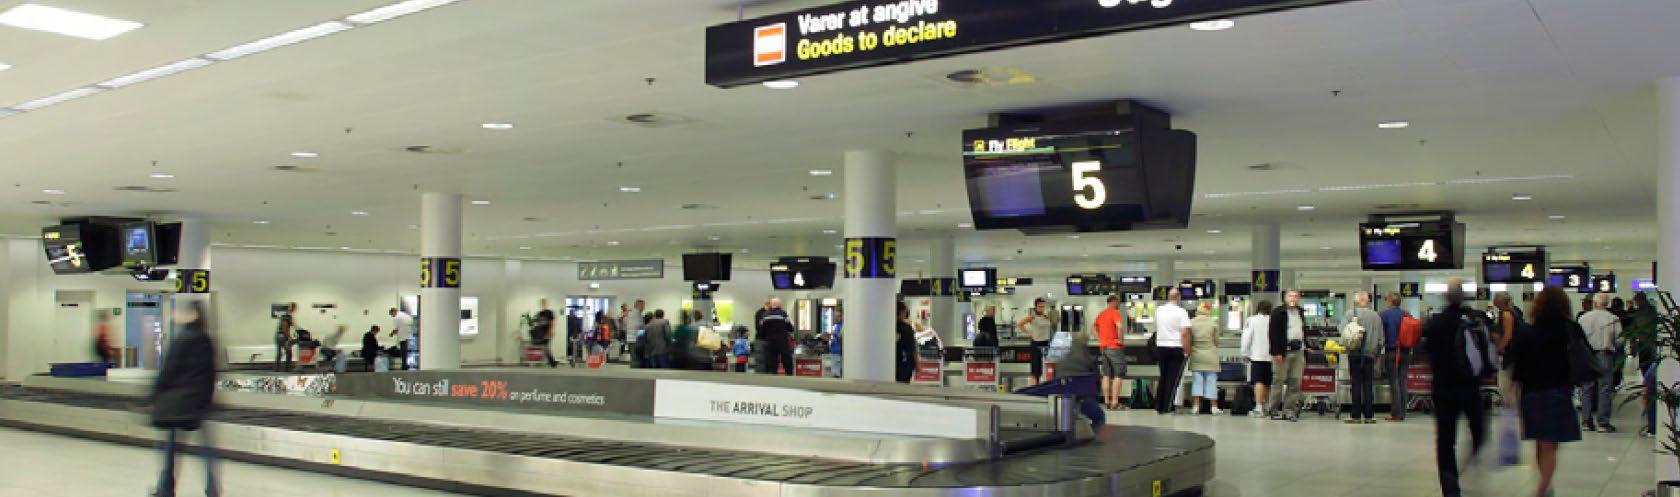 Оптимизация сортировки багажа в аэропорту Копенгагена